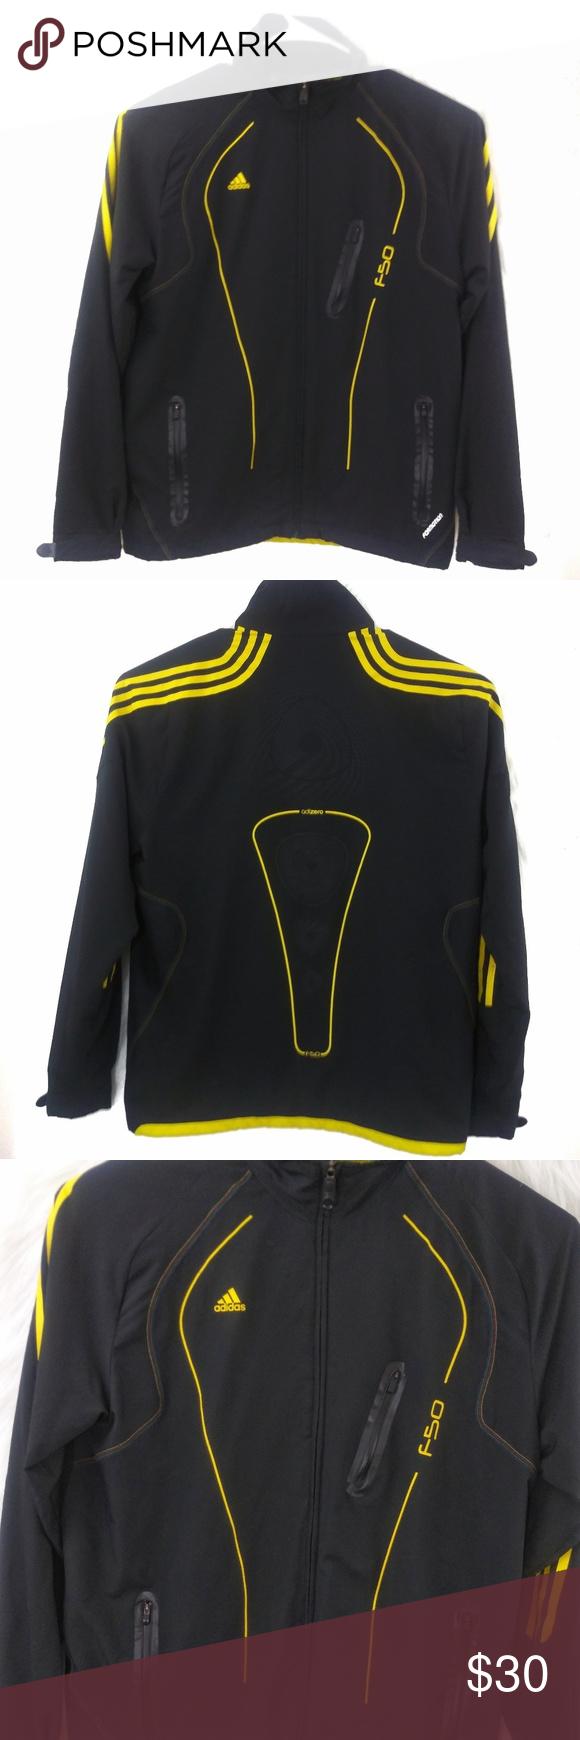 a1b0754400f5d Adidas Adizero Windbreaker Black Yellow Jacket Adidas Adizero Windbreaker  Black Yellow Jacket is in great pre